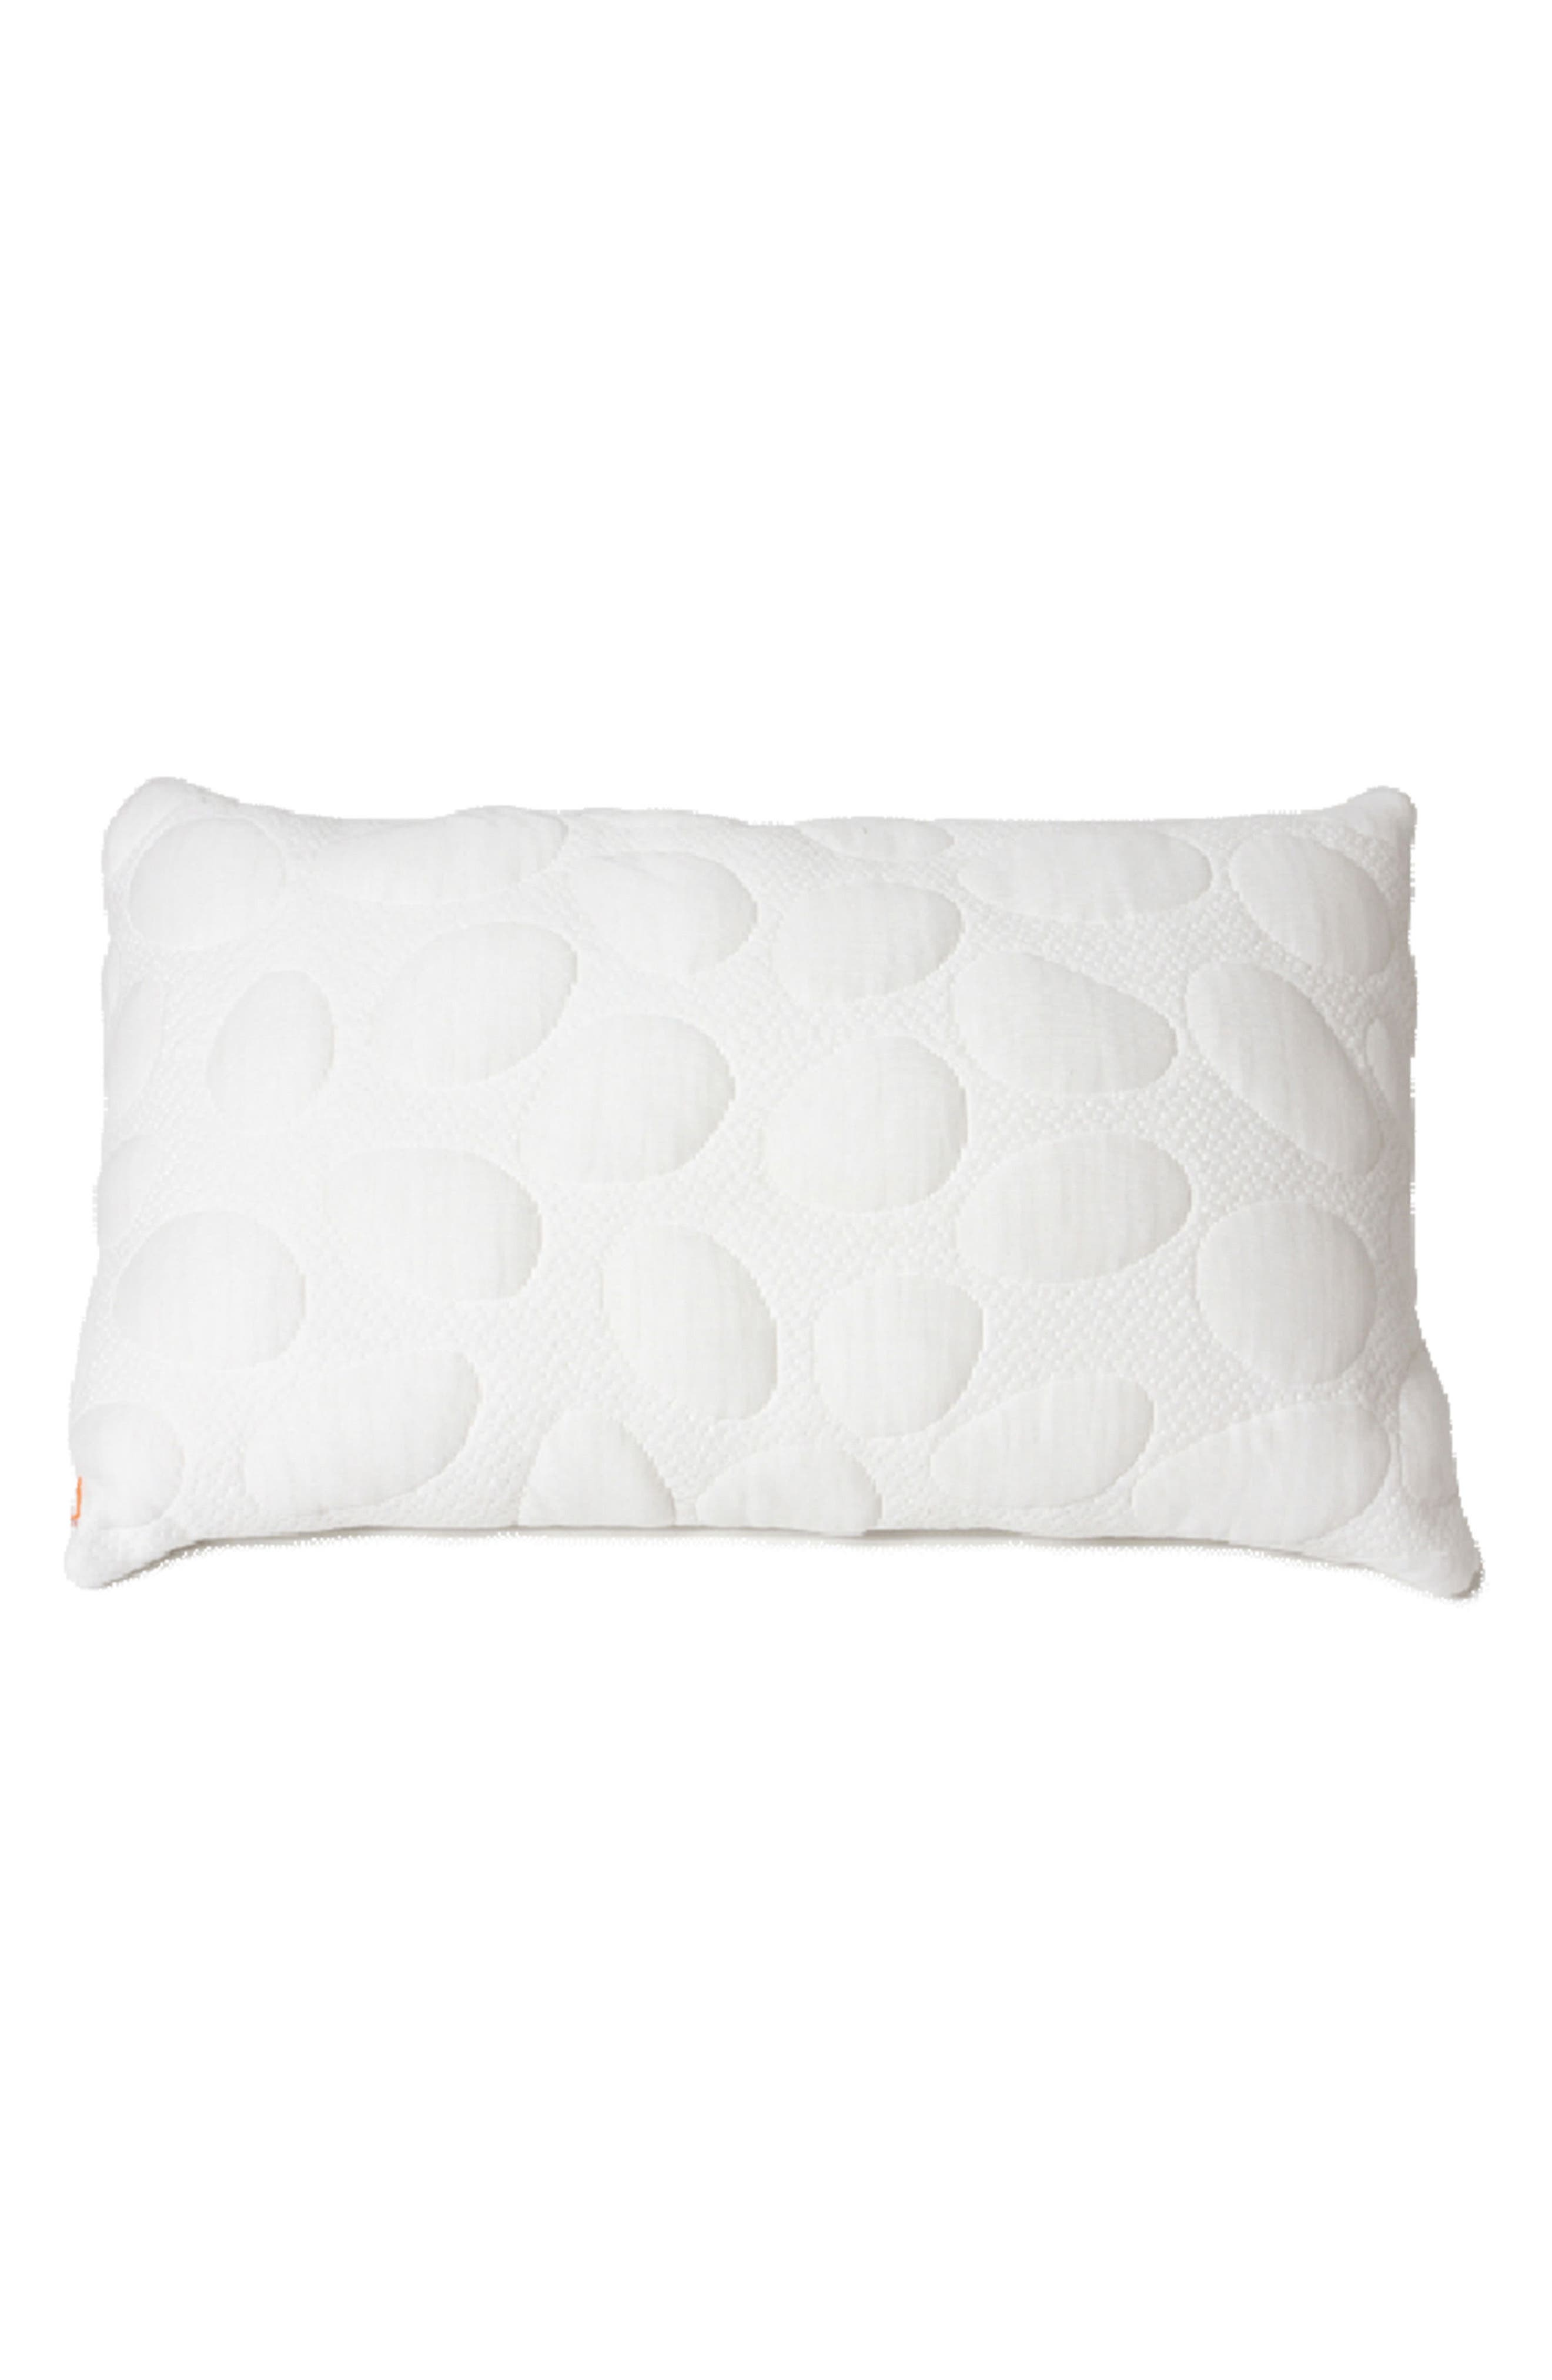 NOOK SLEEP SYSTEMS Nook Pebble Jr. Pillow, Main, color, 100